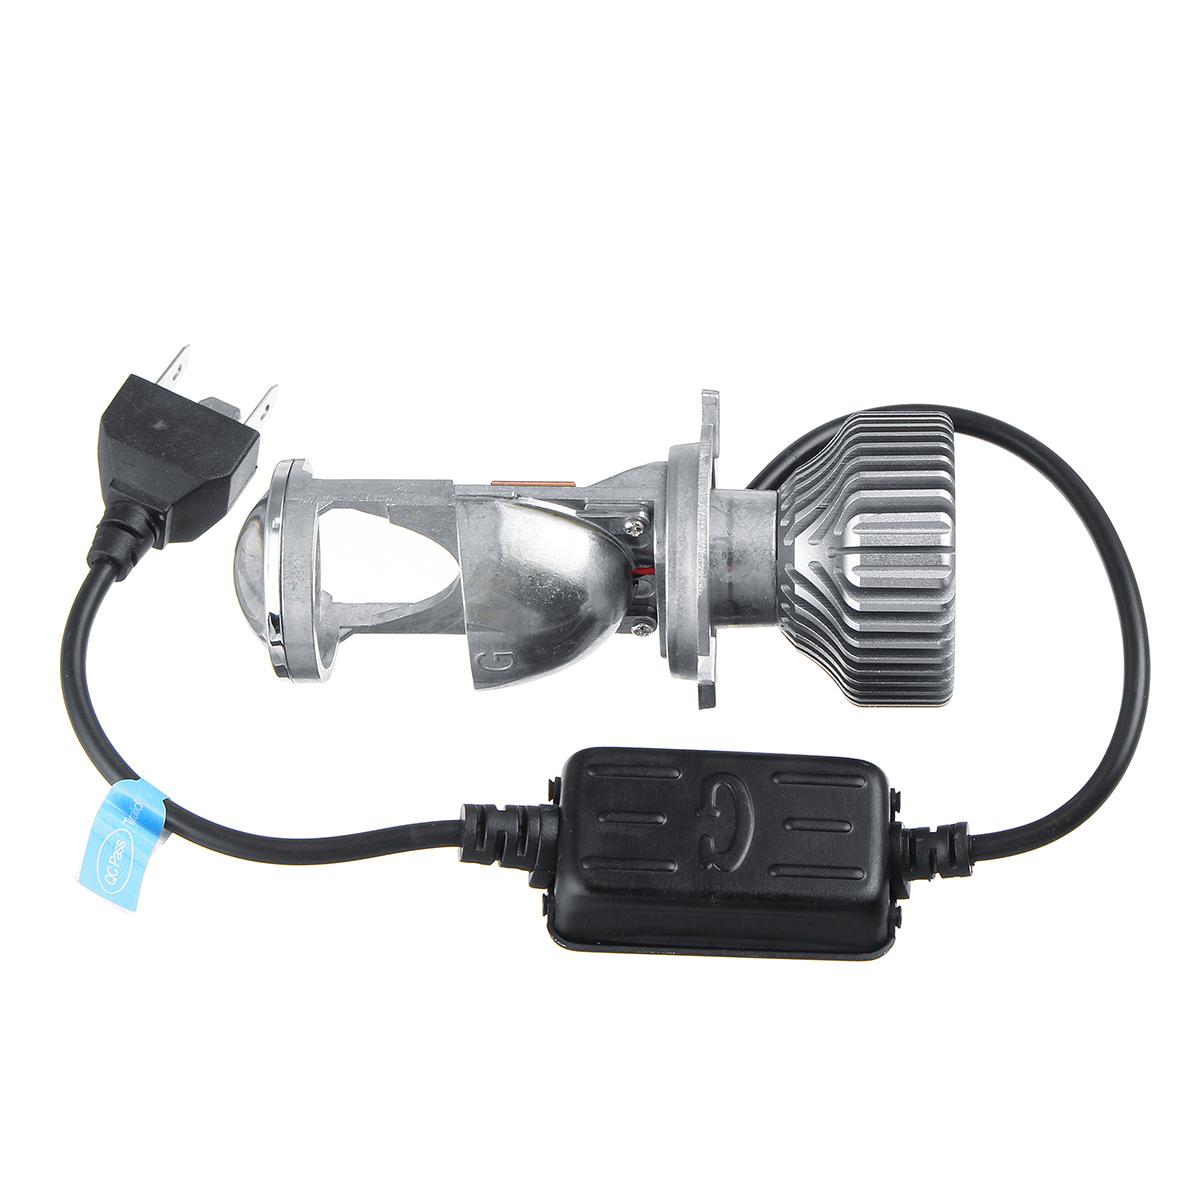 G1 46W H4 LED Lens Projector Headlights Bulb High Low Dual Beam 6000K White 2PCS 12V for LHD/RHD Car Motorcycle